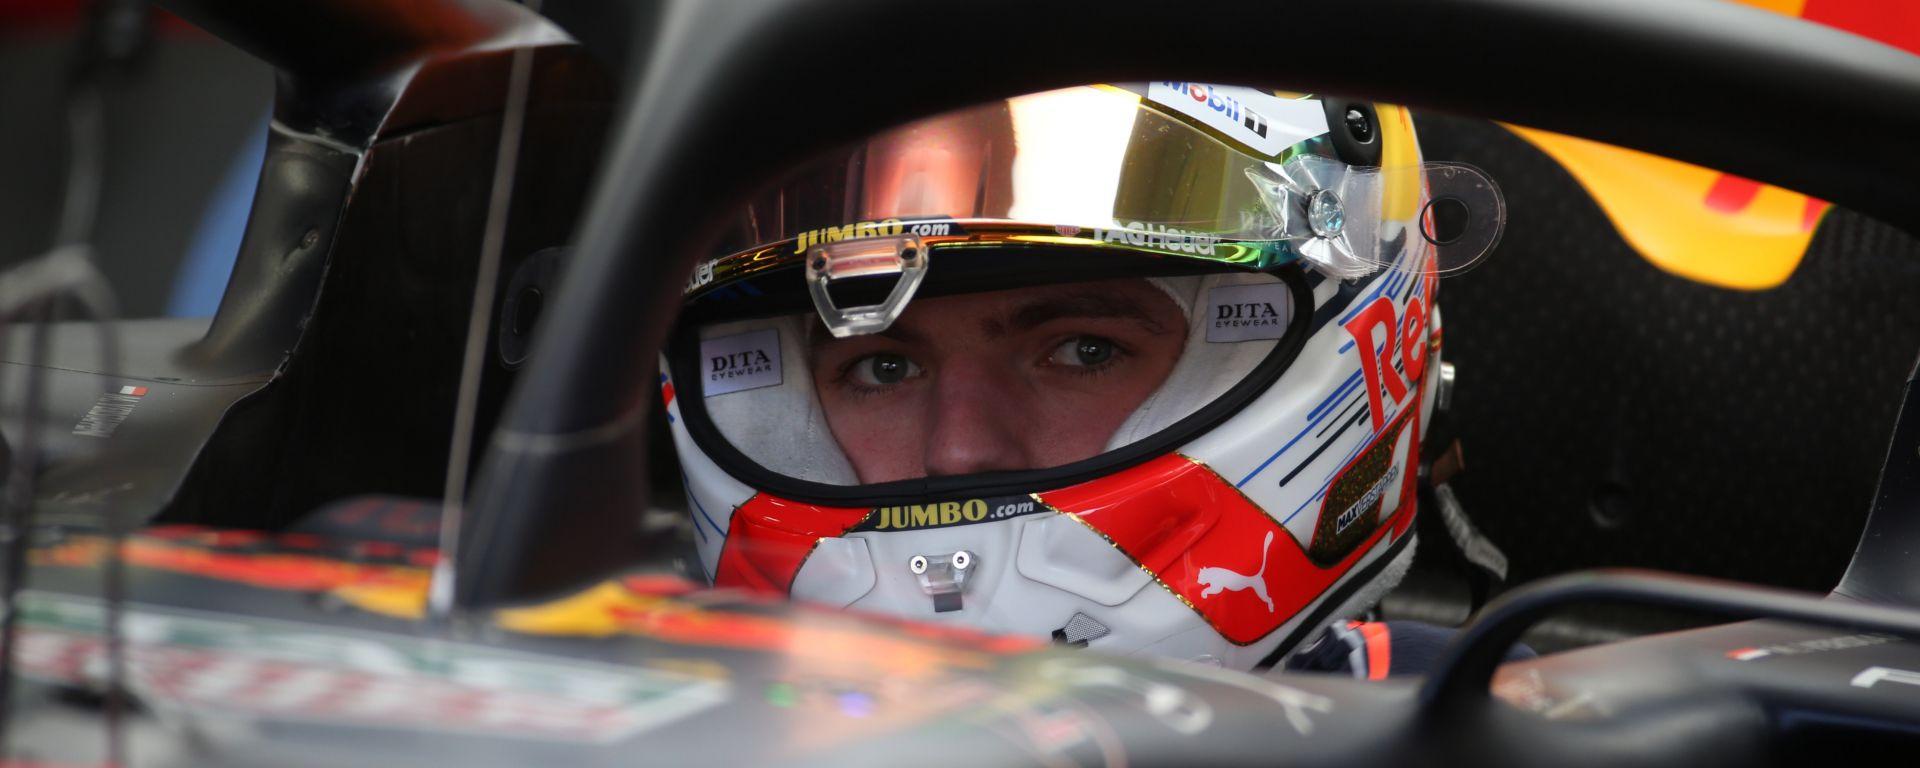 F1 GP USA 2019, Austin: Max Verstappen (Red Bull)